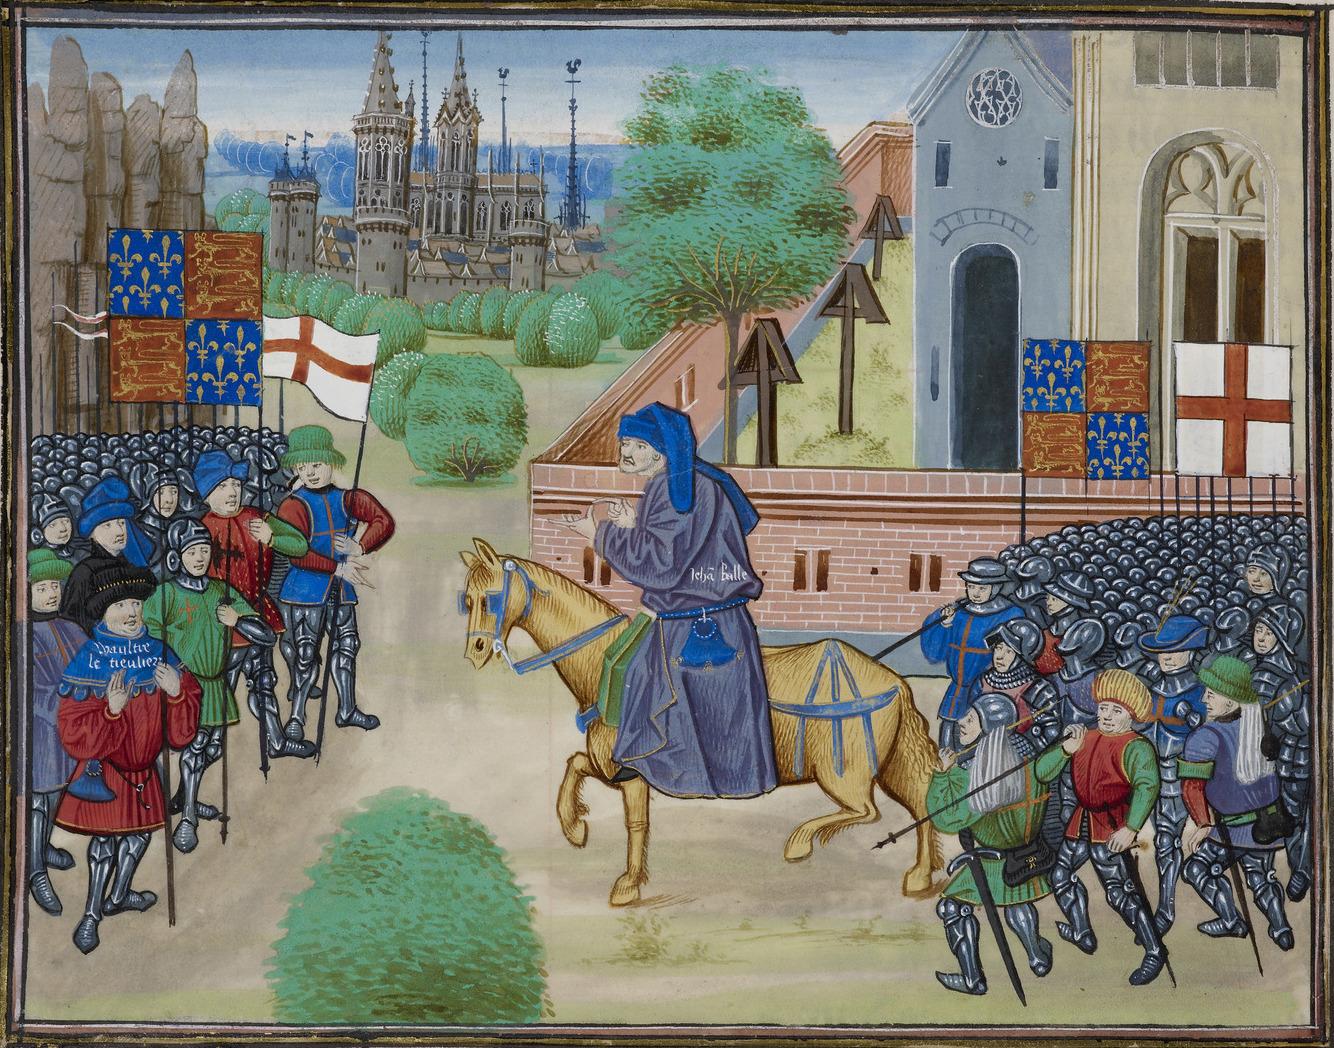 external image The_Peasants%27_Revolt_-_Froissart%2C_Chroniques_de_France_et_d%27Angleterre%2C_Book_II_%28c.1460-1480%29%2C_f.165v_-_BL_Royal_MS_18_E_I.jpg